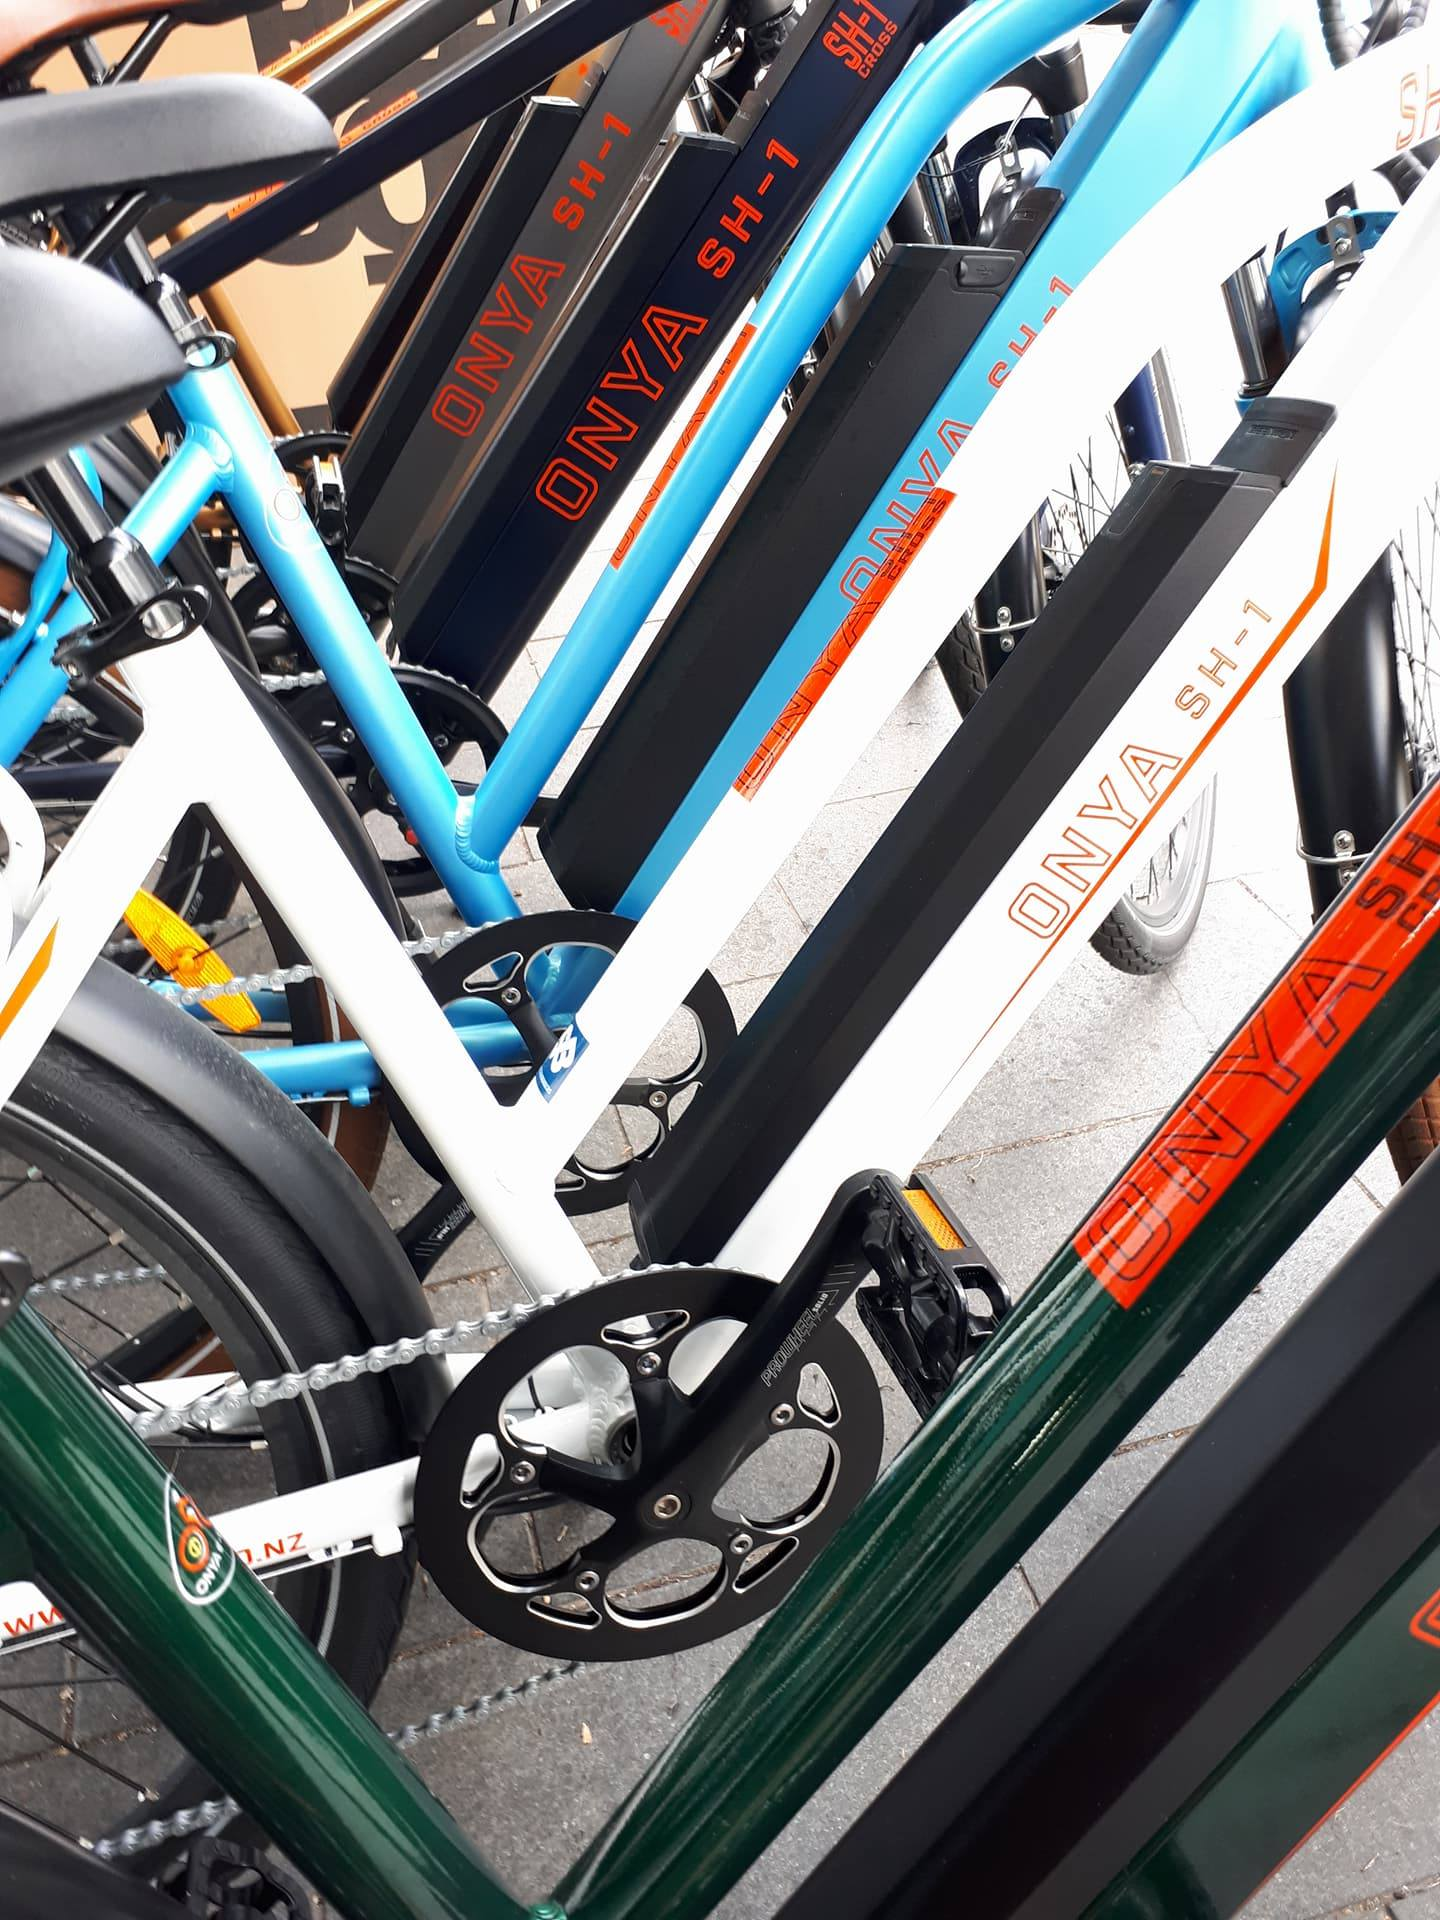 Row of ONYA SH1 E Bikes